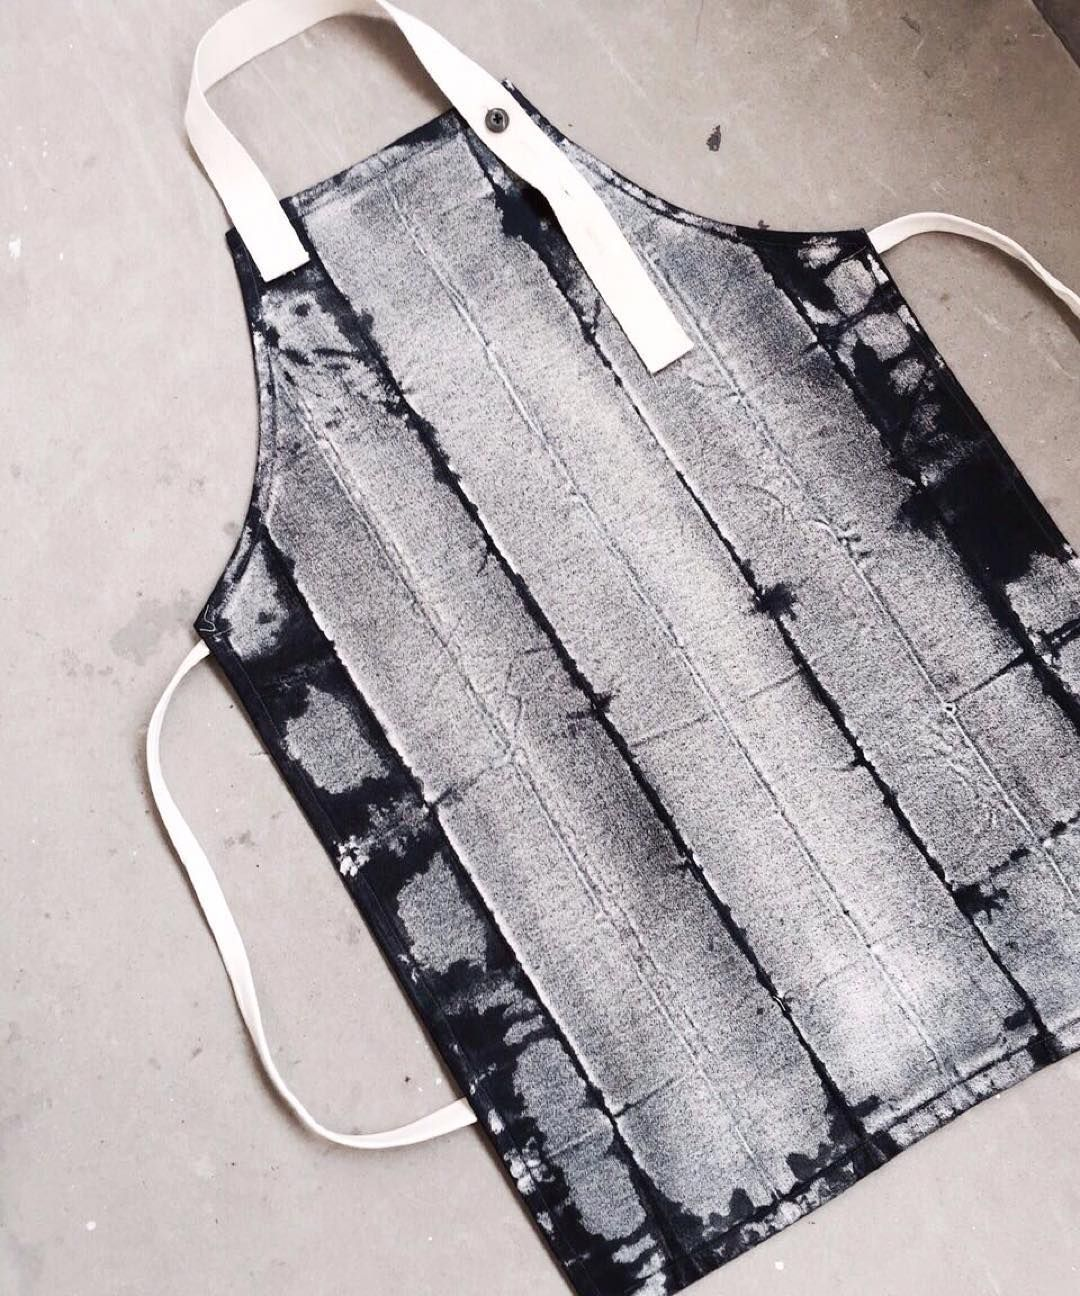 White apron singapore - Hand Dyed Shibori Inspired Apron Shibori Art Craft Cooking